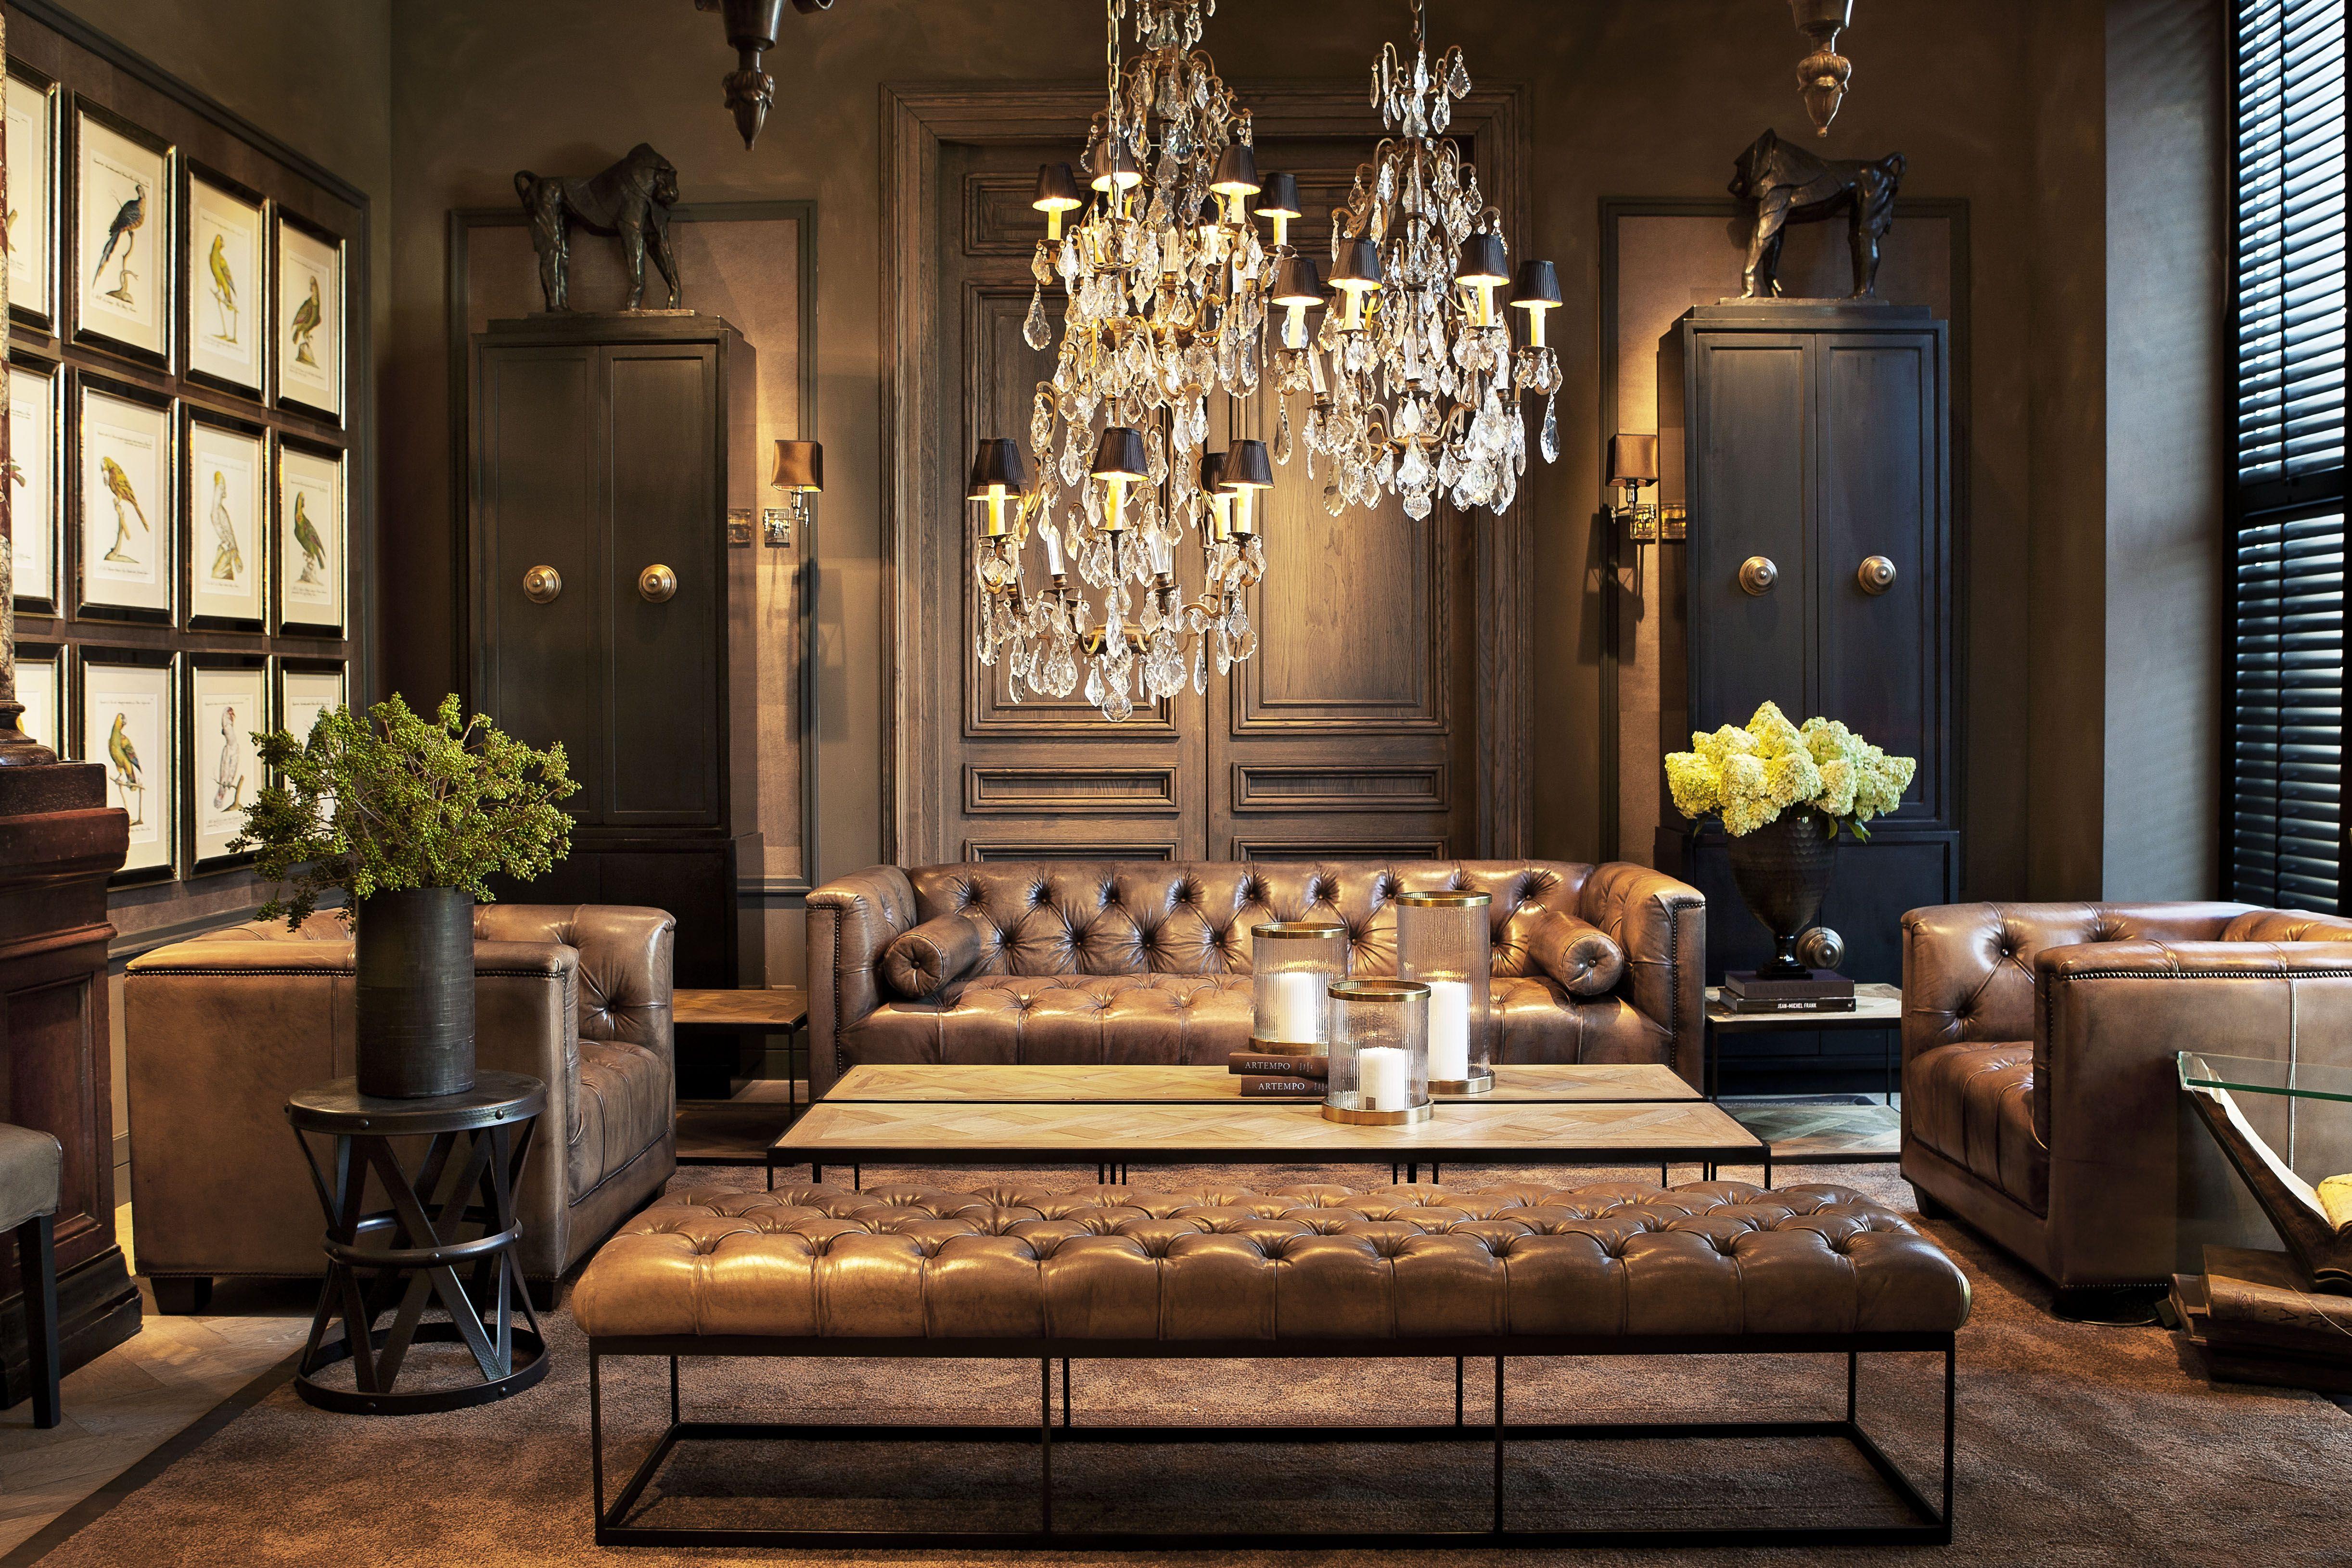 Plein Soleil Decoration 23 Rue Terrazzani 98000 Monaco Slots Decoration Deco Maison Deco Rustique